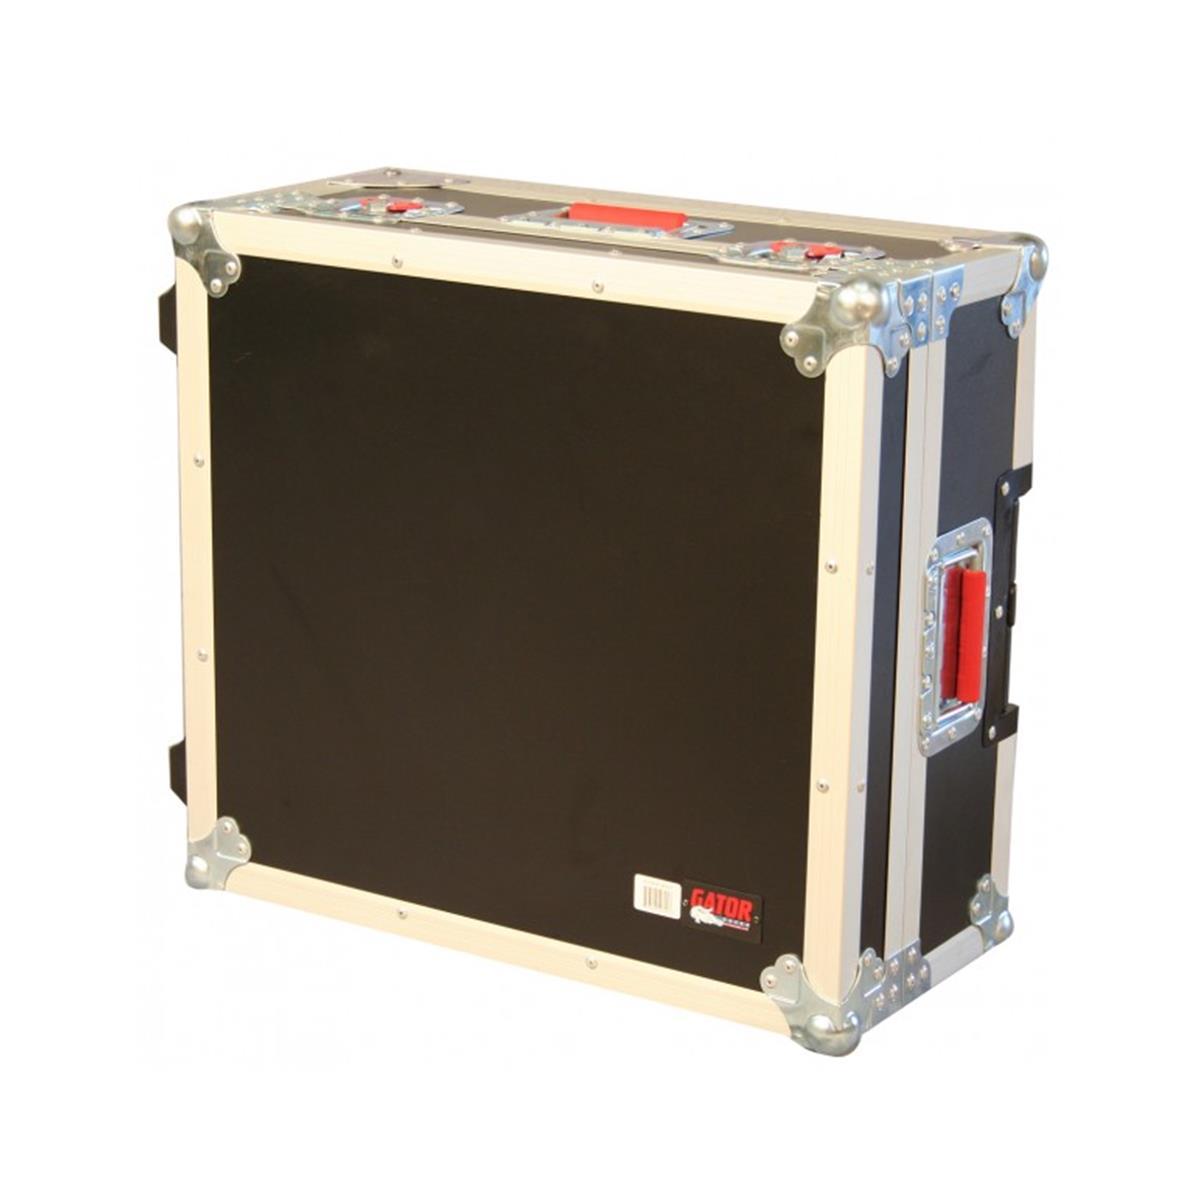 Gator-Cases-G-TOUR-19X21-case-per-mixer-sku-2756714413005